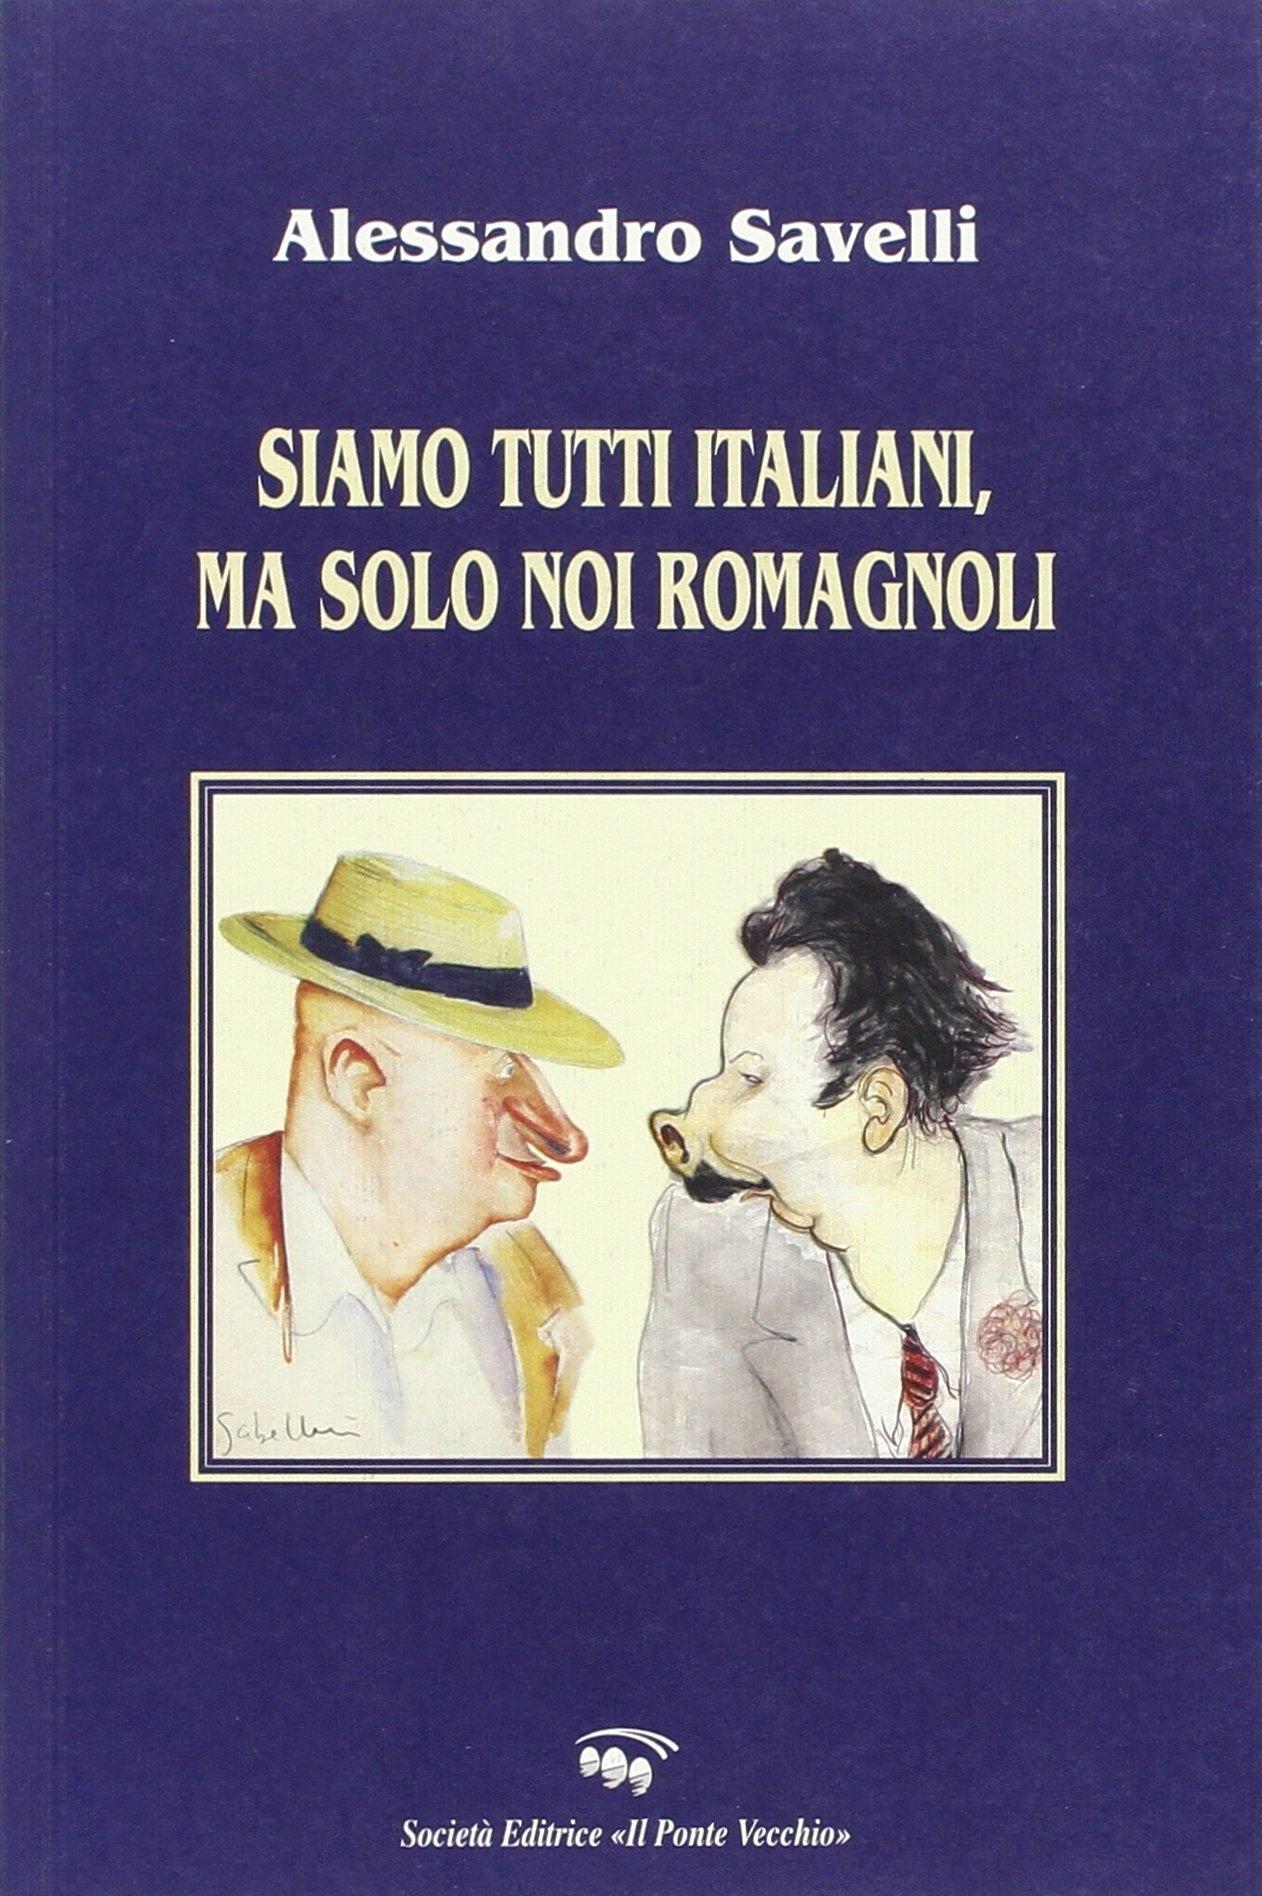 Siamo tutti italiani, ma solo noi romagnoli